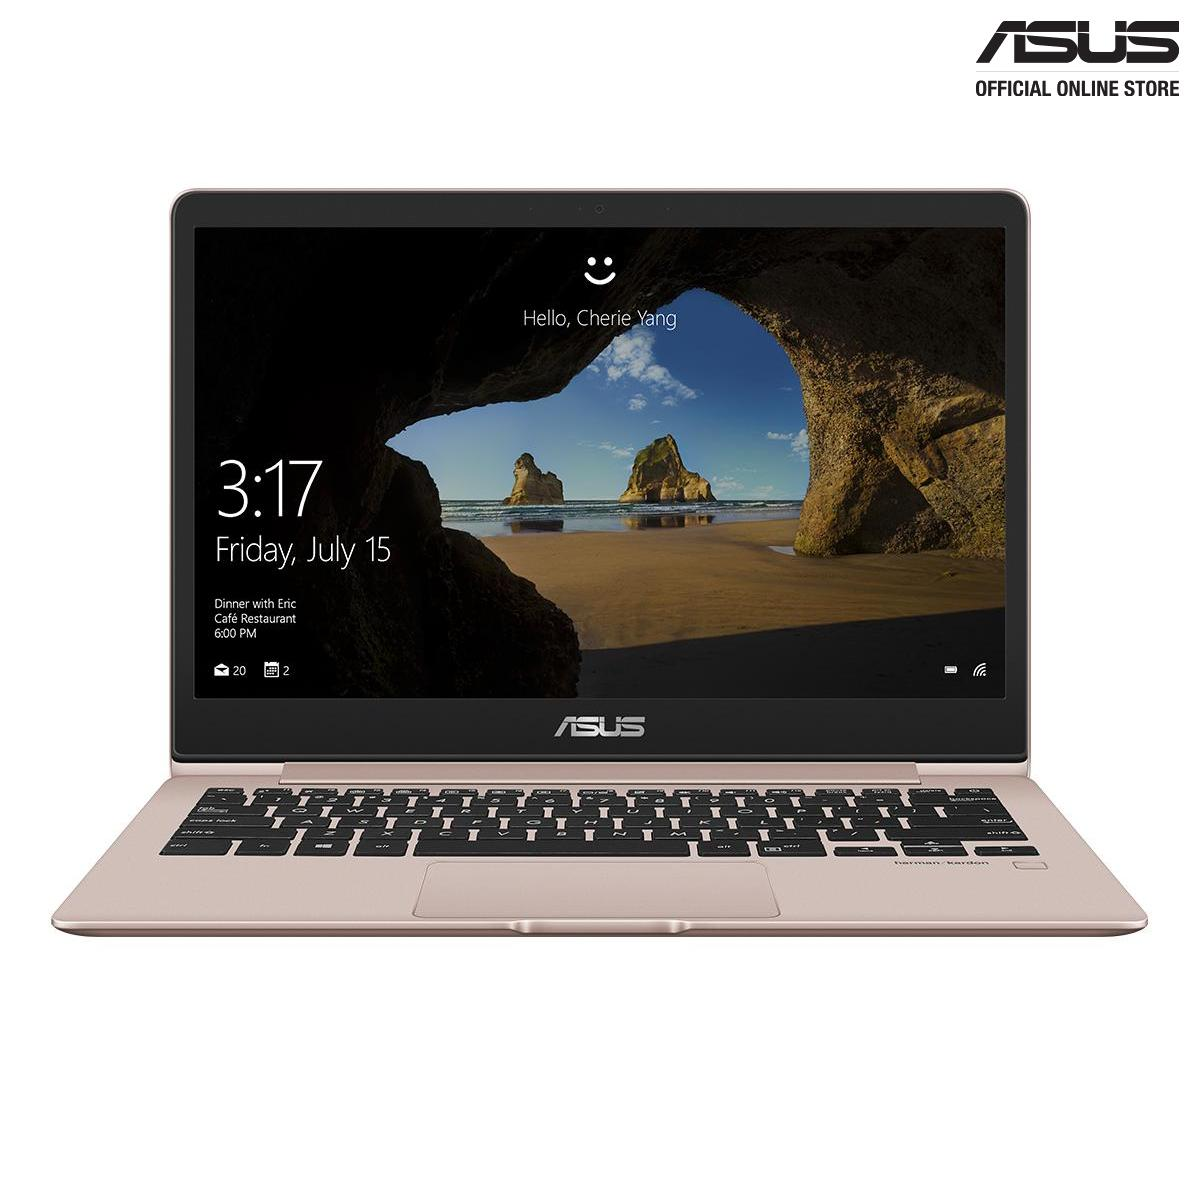 ASUS ZenBook UX331UAL-EG058T (Rose Gold)